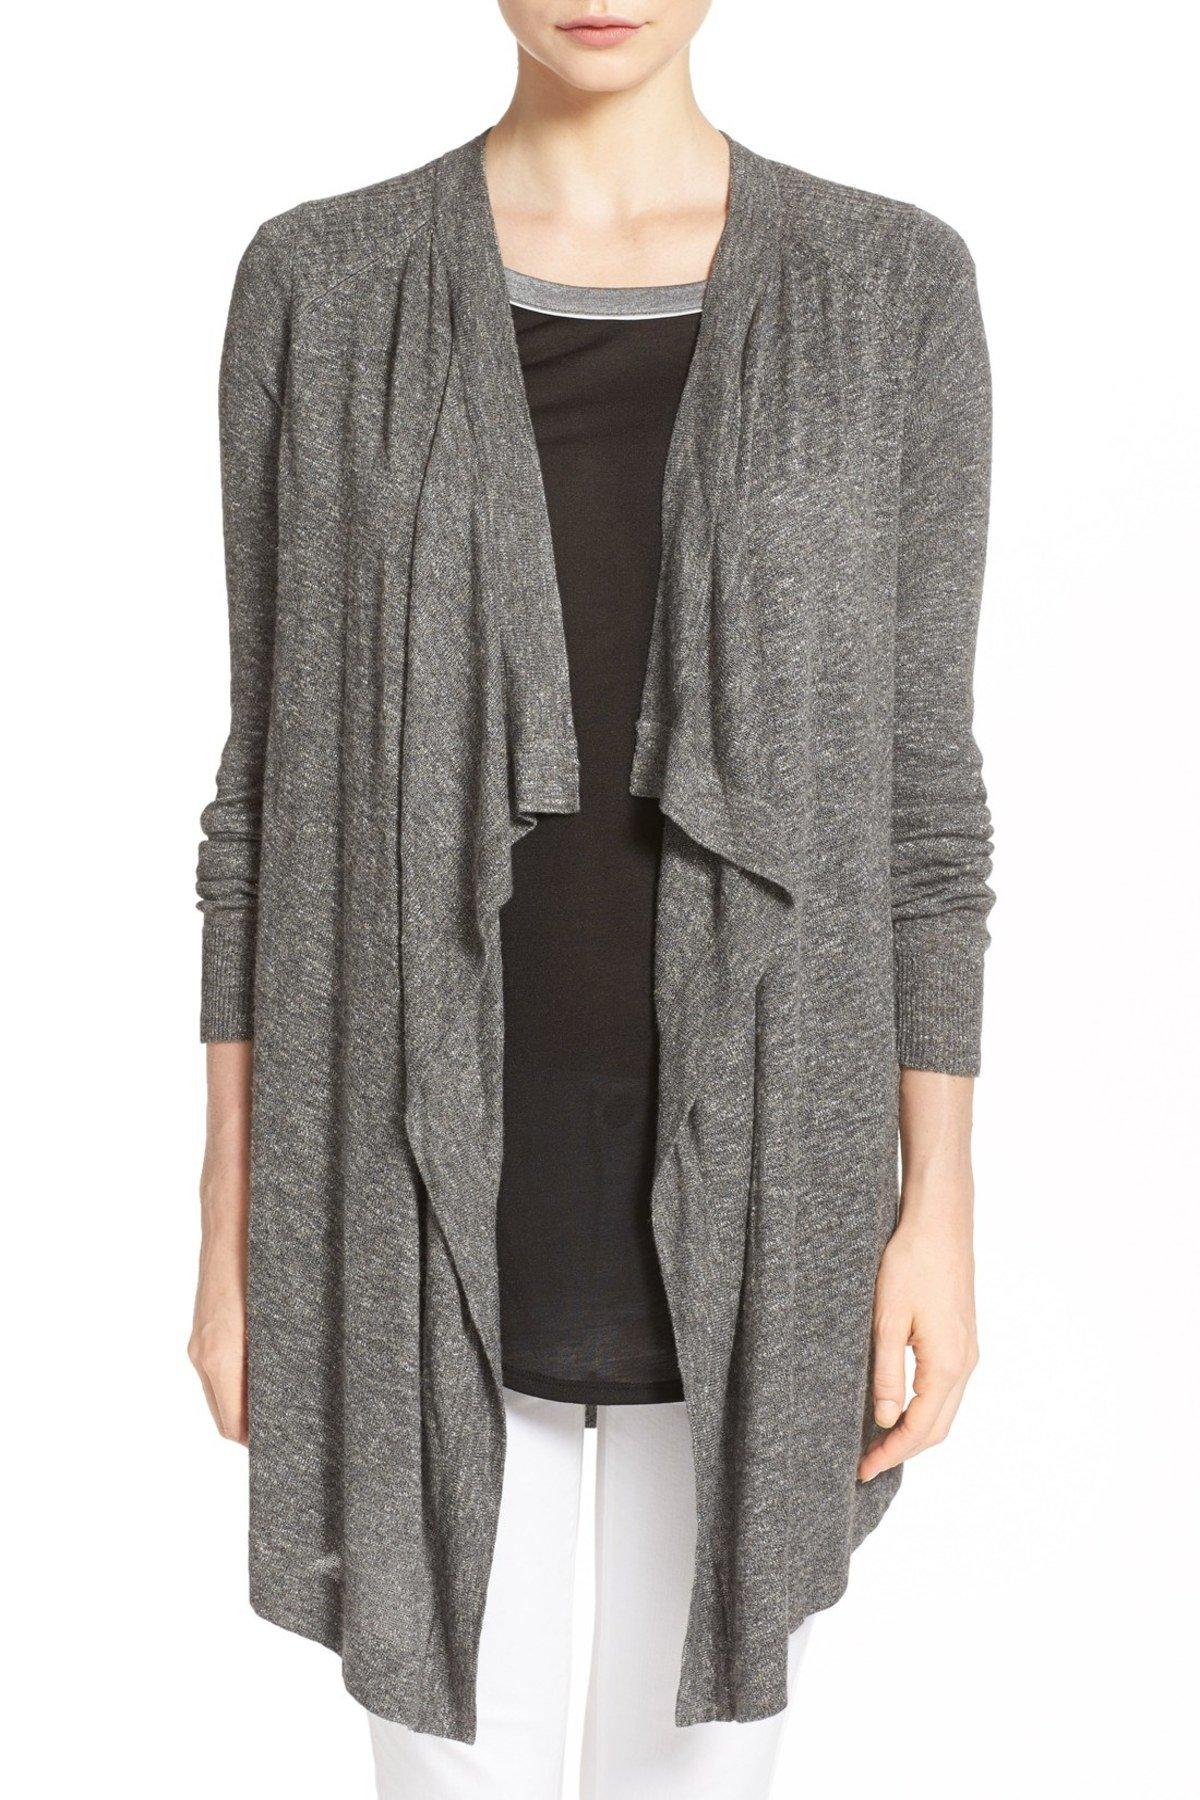 Vince. Women's Fine Gauge Slub Cardigan Sweater Heather Carbon (Gray) Size Small